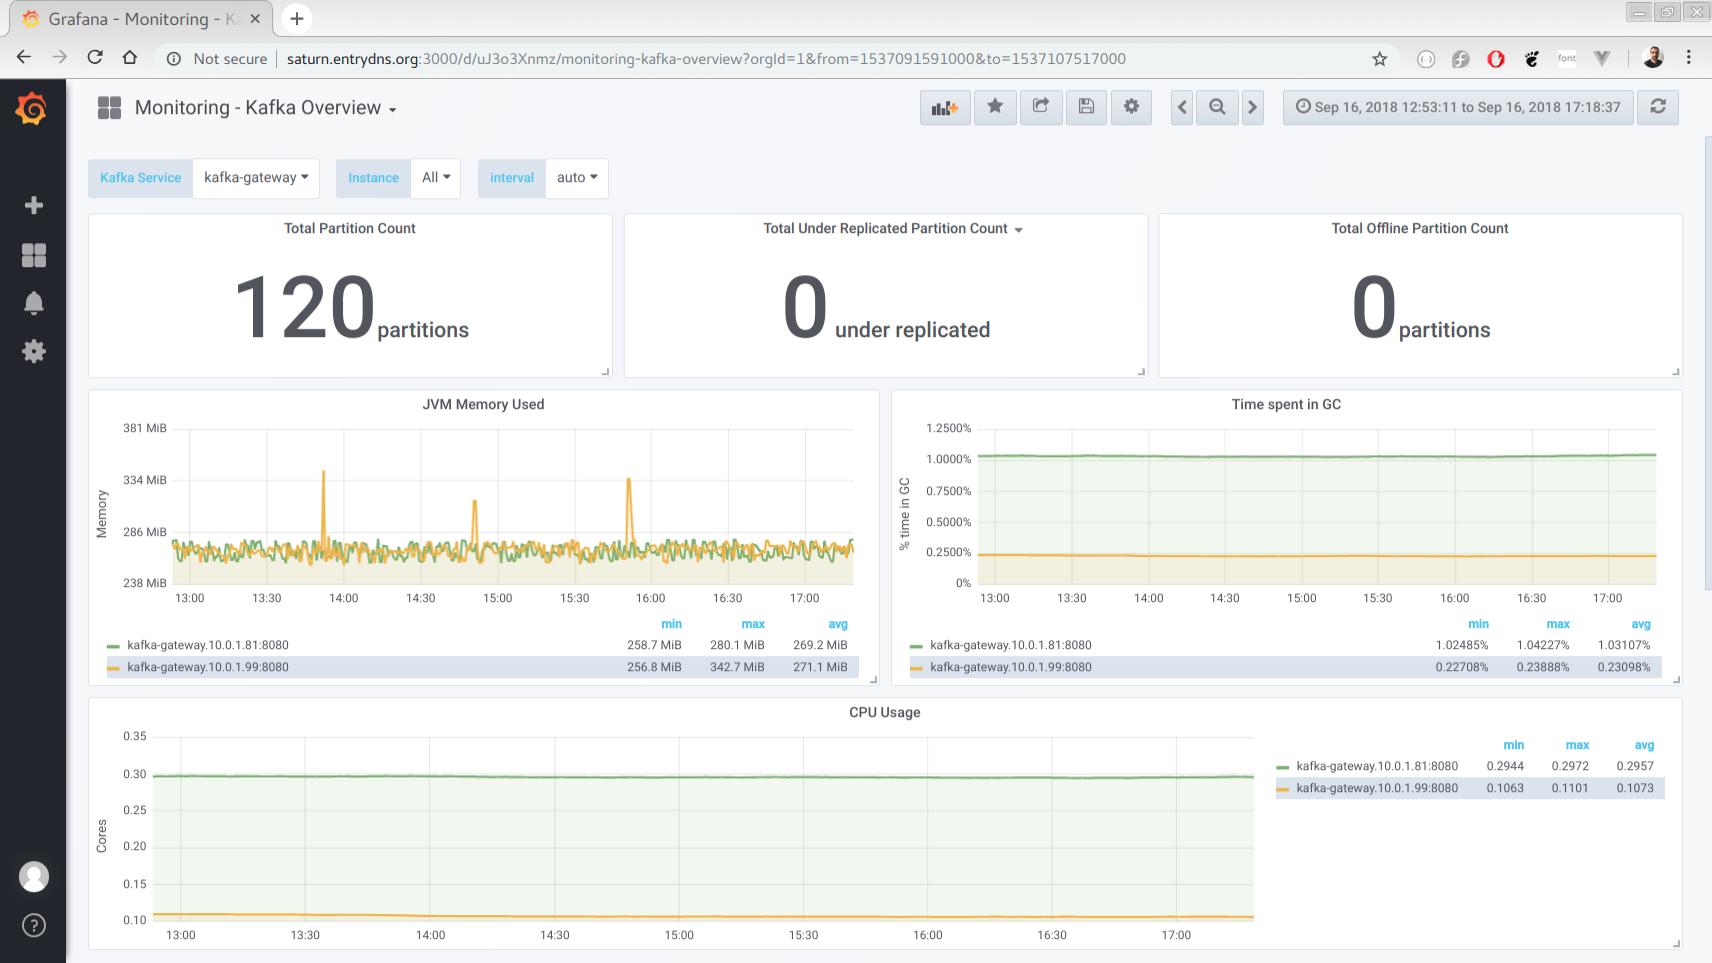 monitoring_kafka_overview